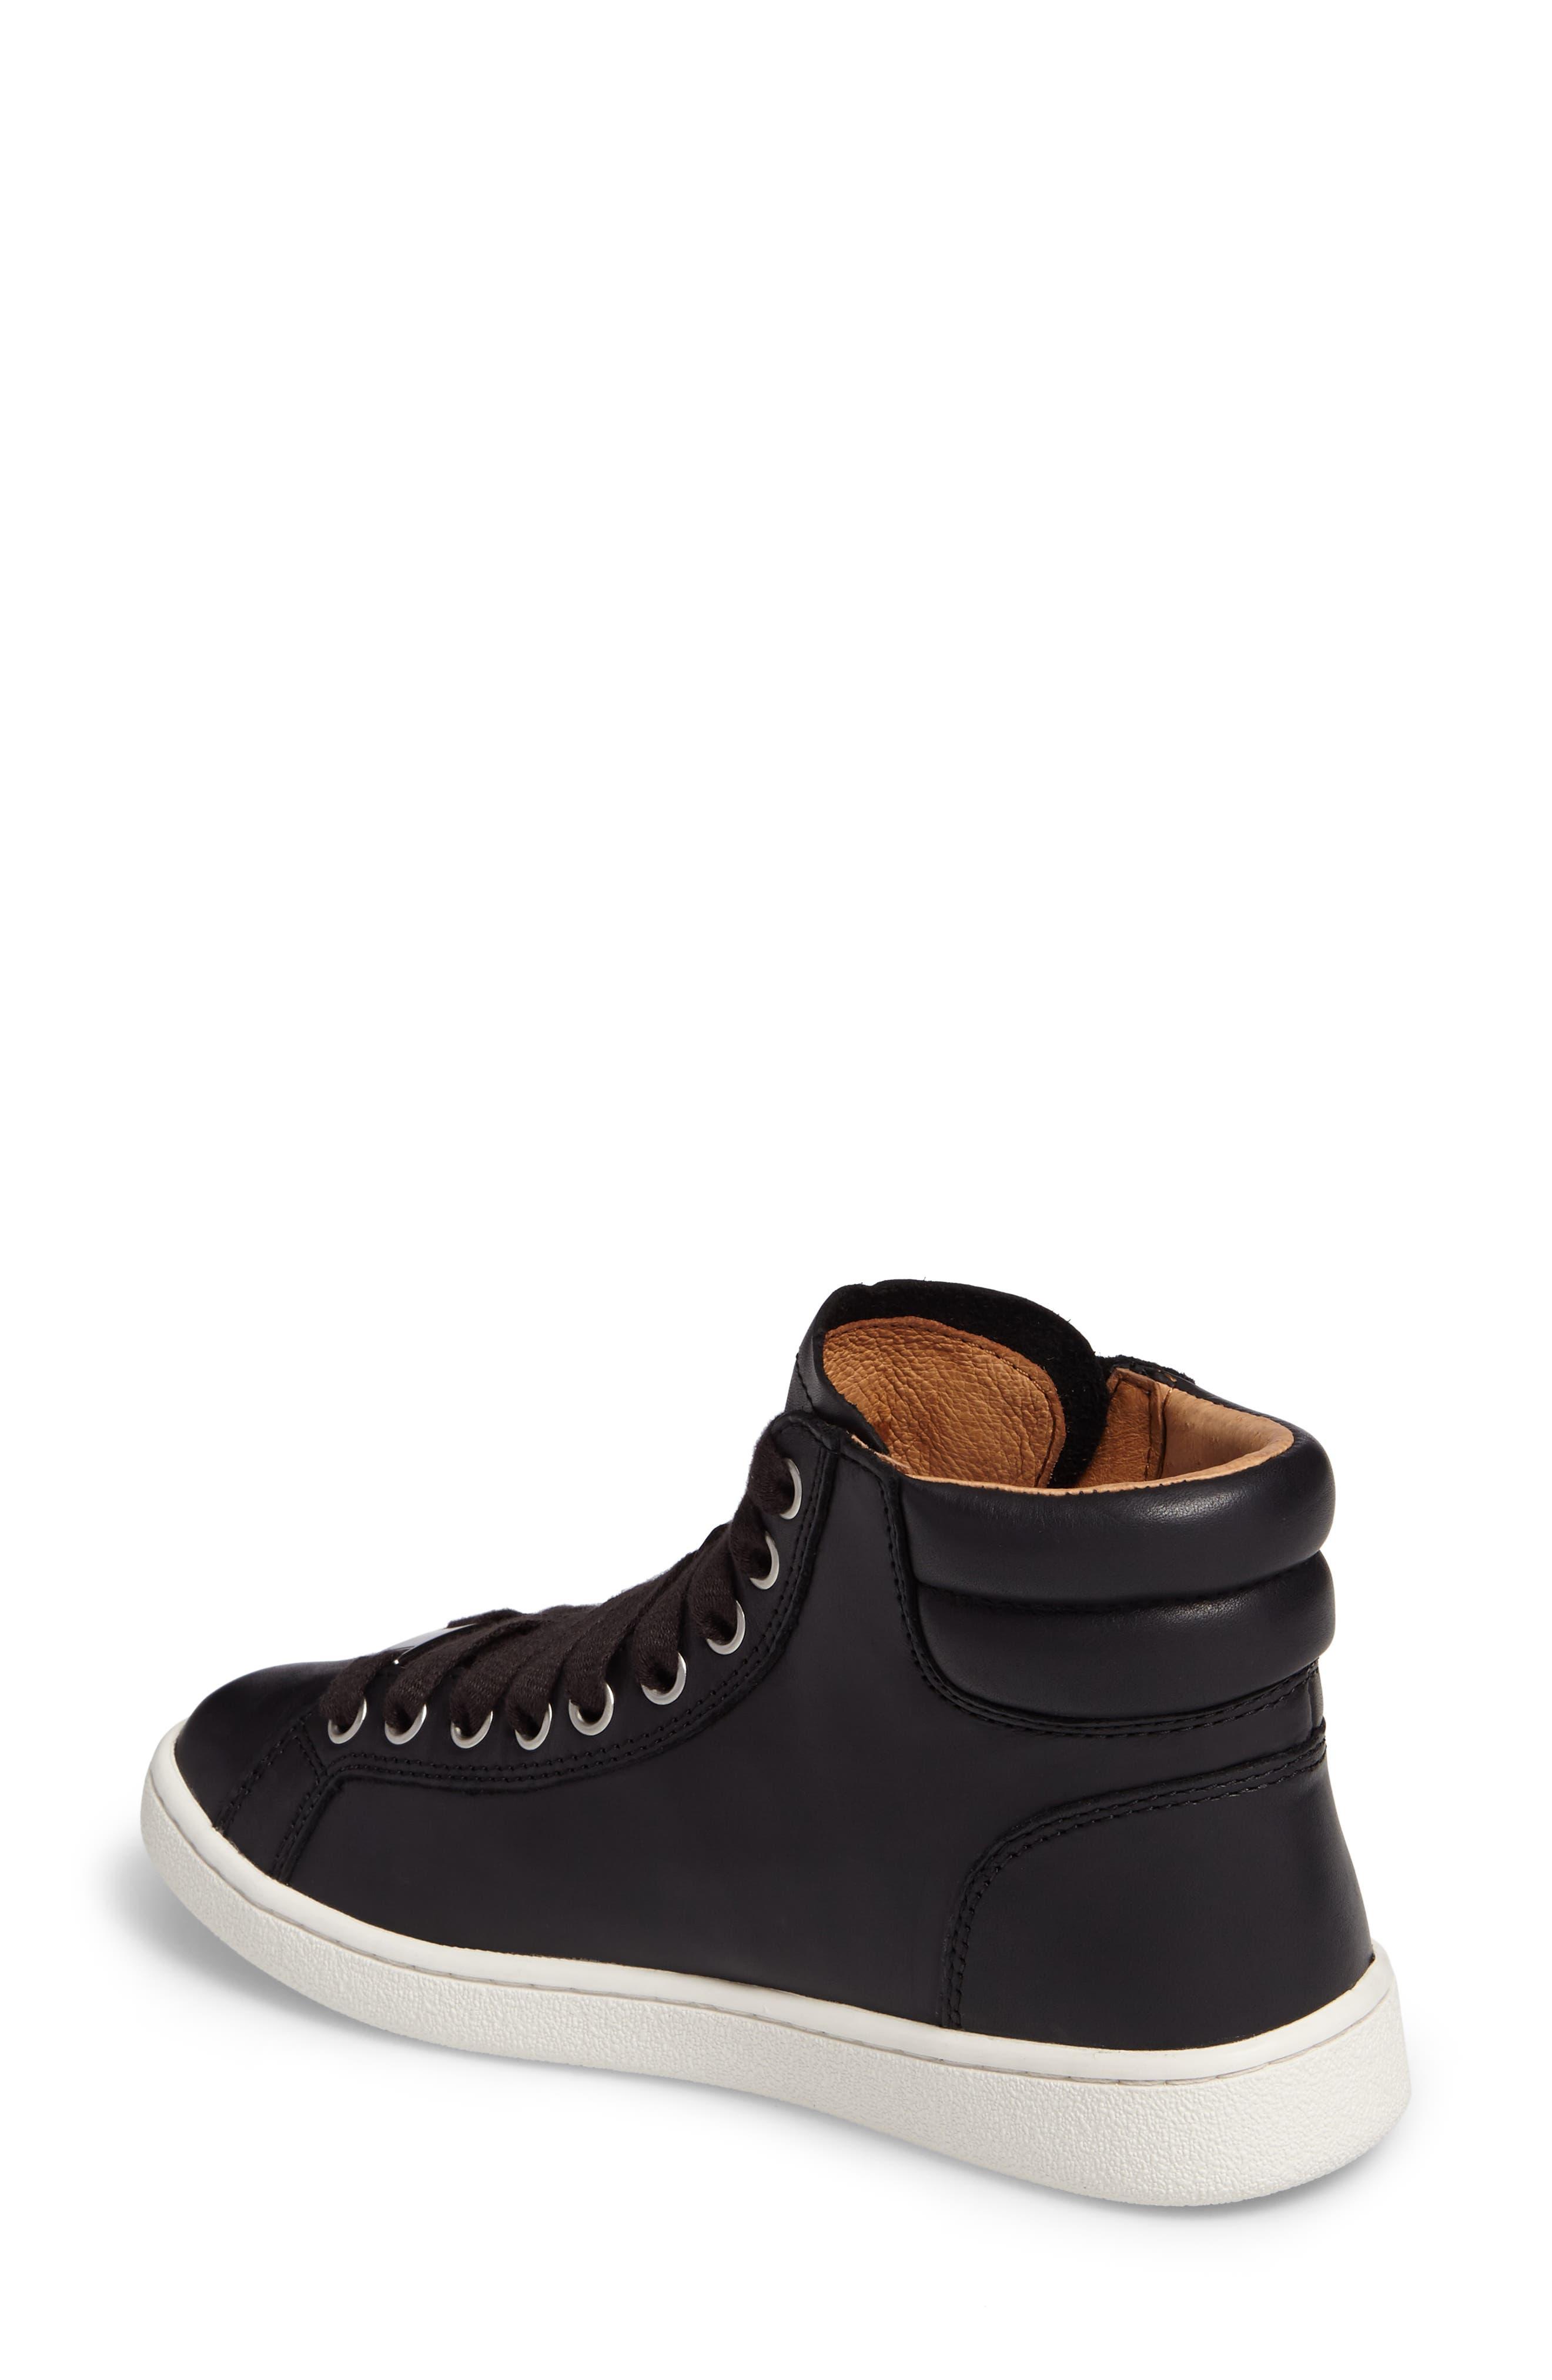 UGG<SUP>®</SUP>, UGG Olive High Top Sneaker, Alternate thumbnail 2, color, BLACK LEATHER